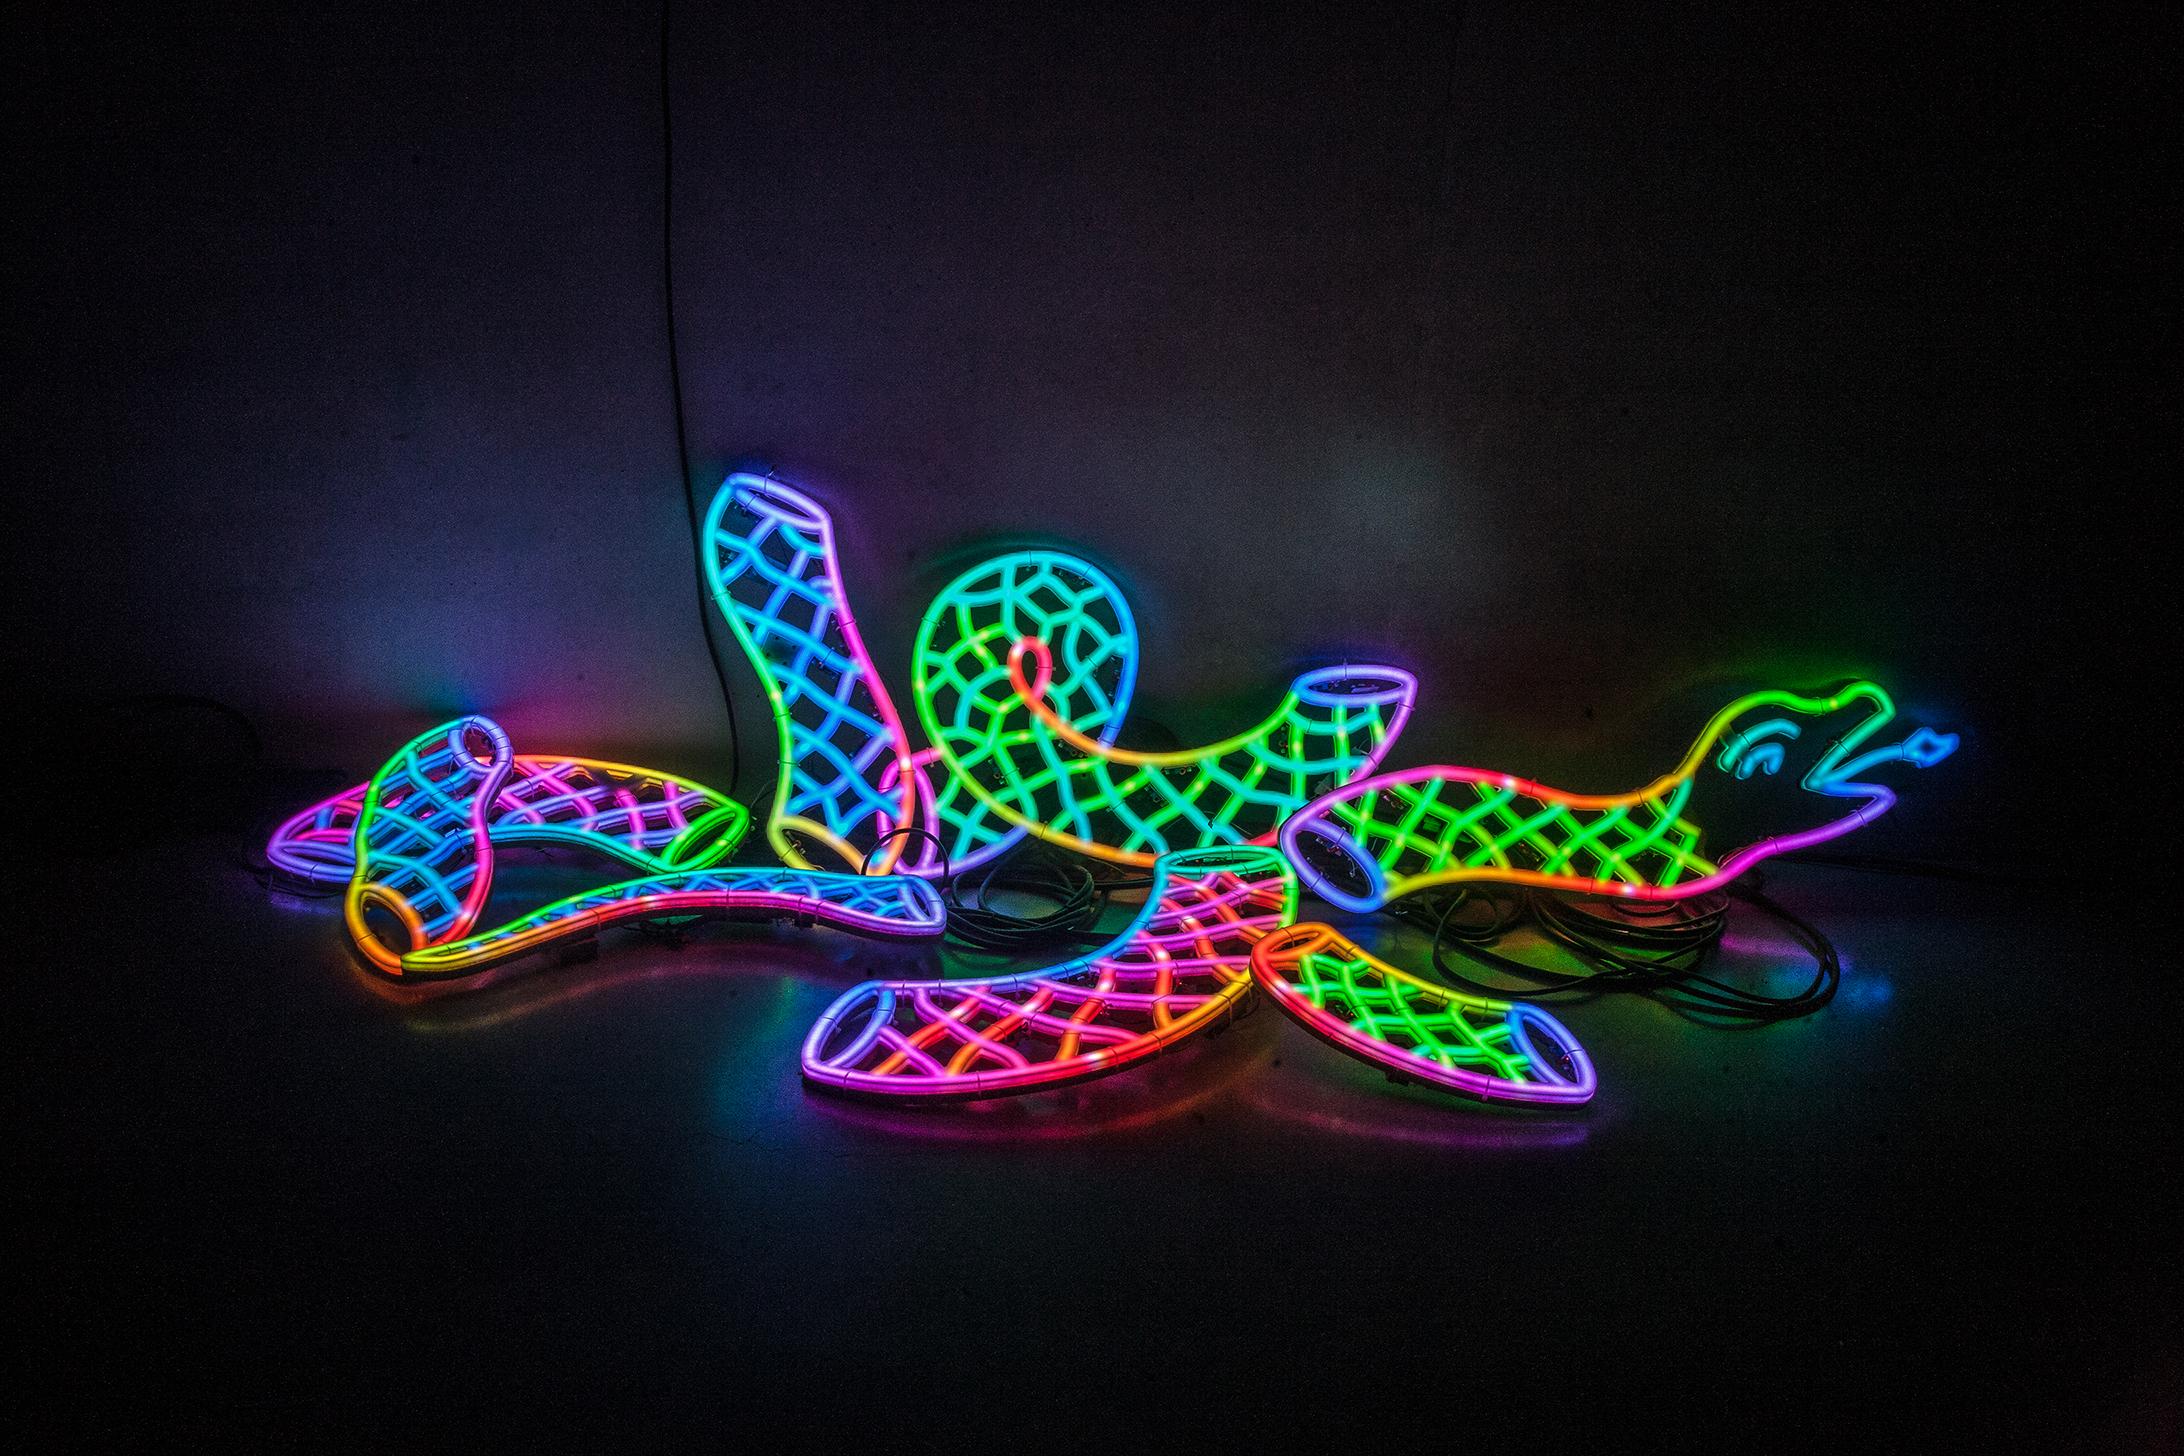 2018 Neon light 171 7/10 × 66 9/10 in (436 × 170 cm) - Marc Straus Gallery